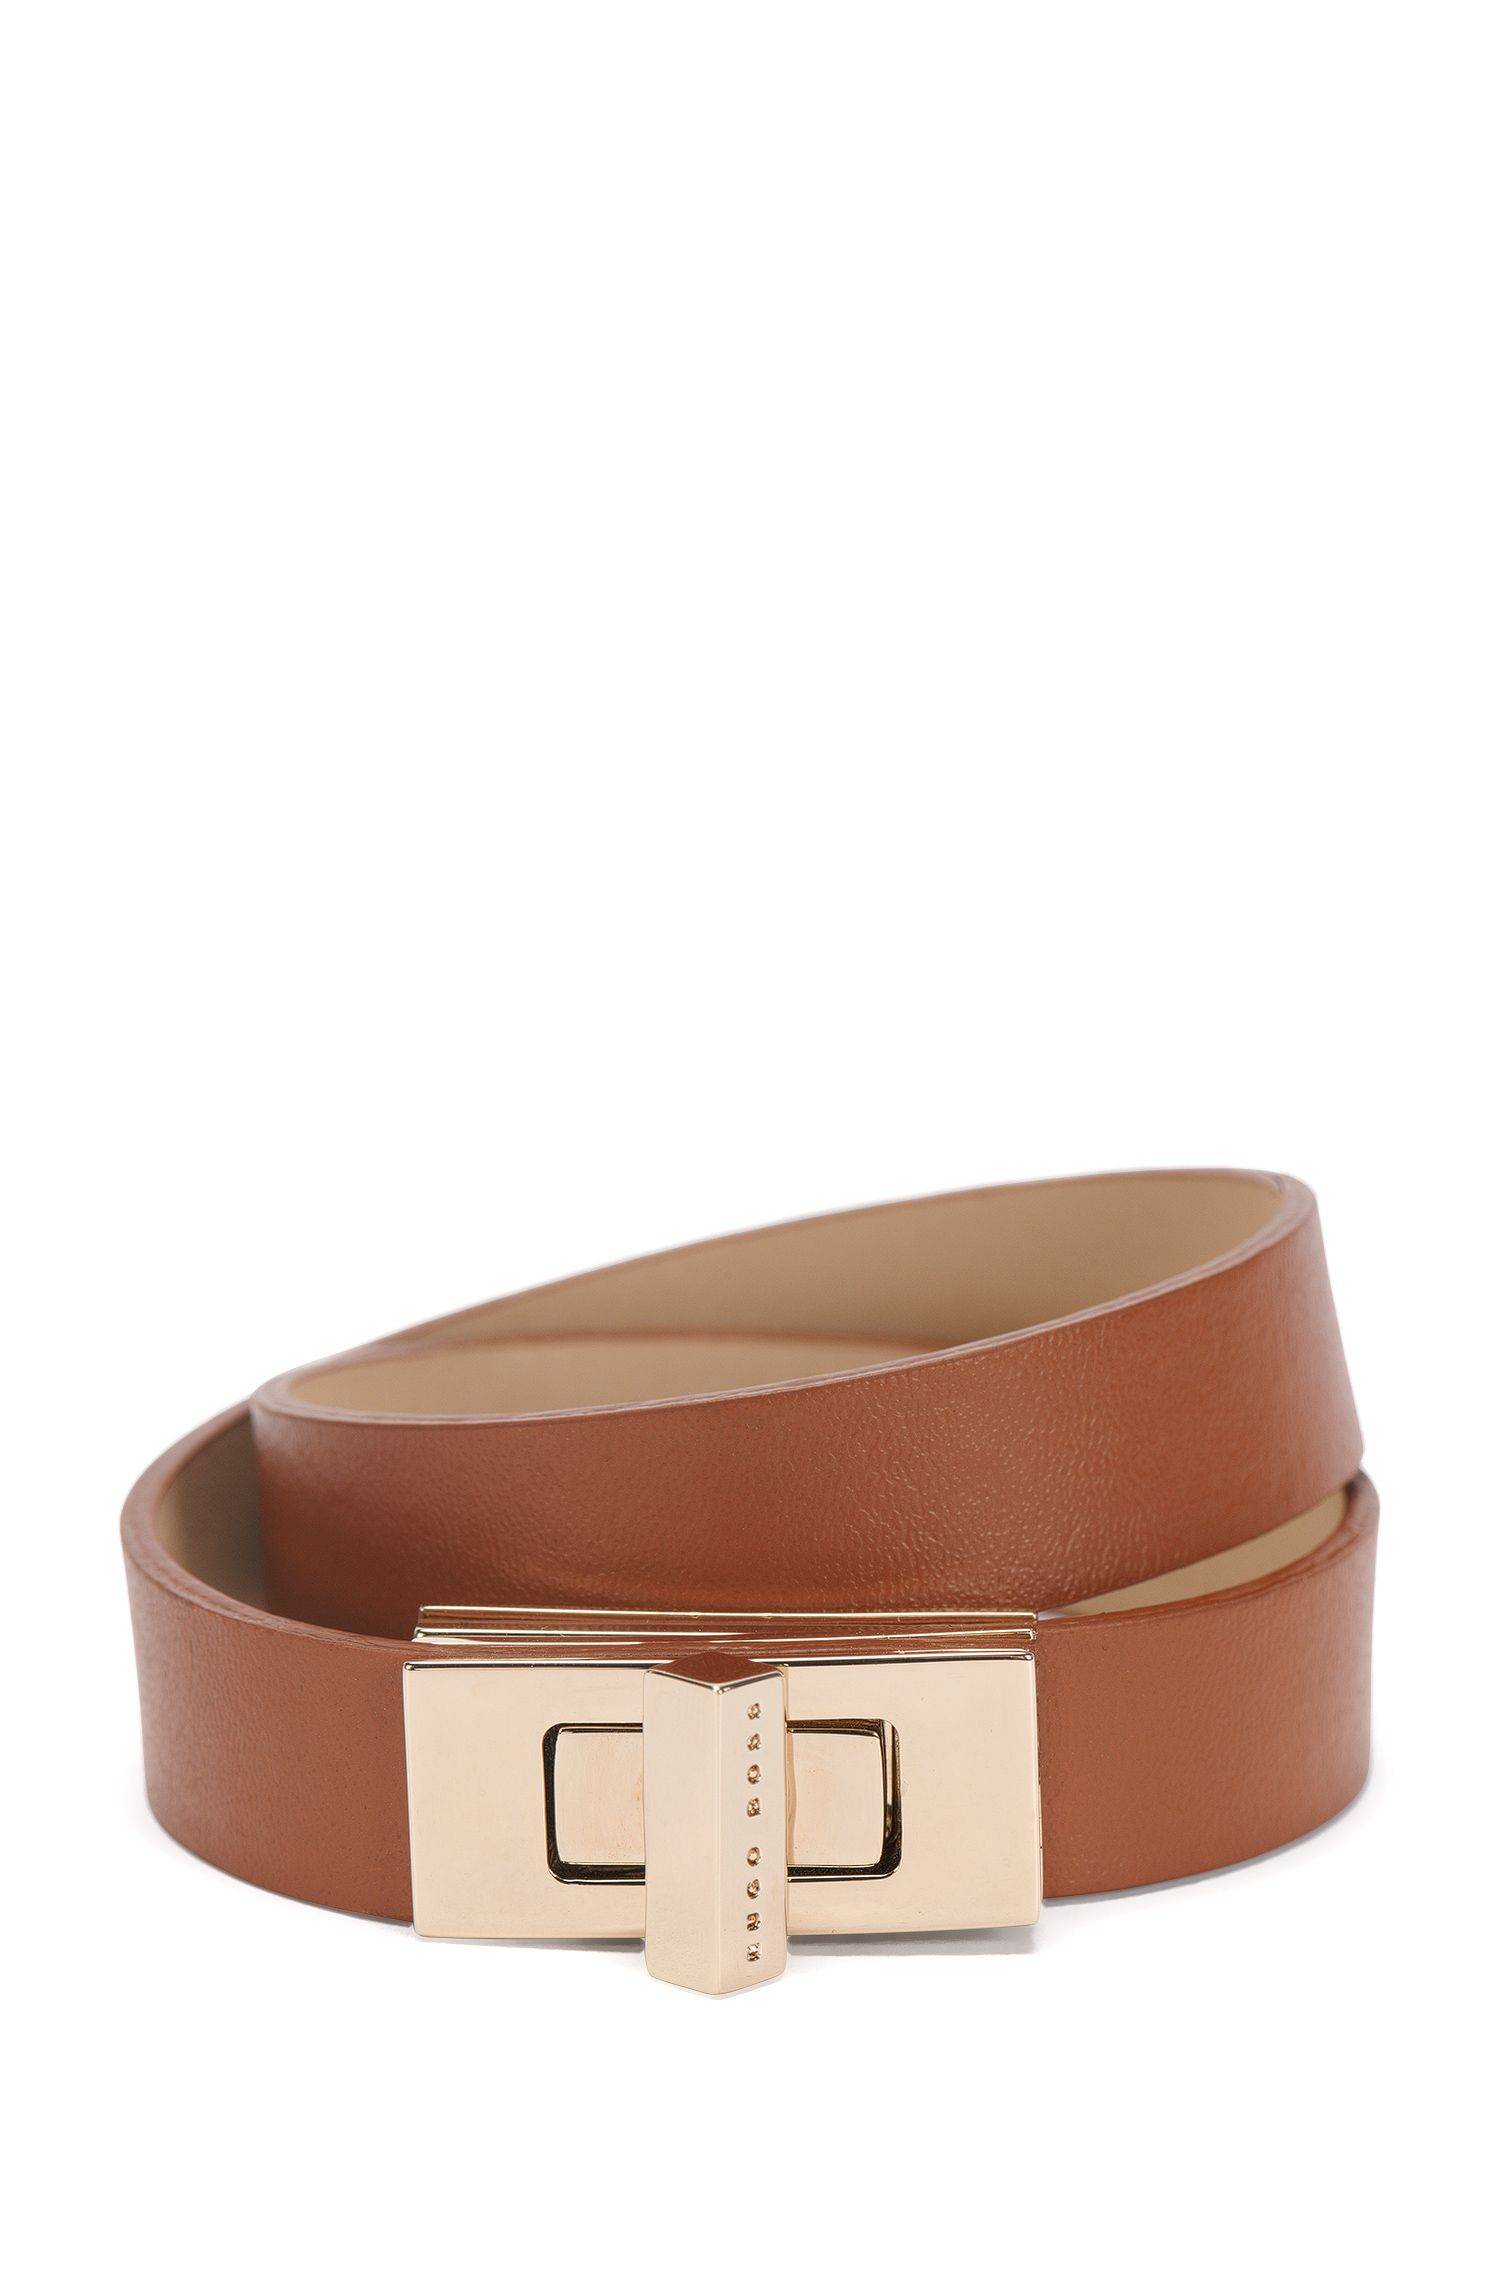 BOSS Bespoke leather bracelet with signature cufflink closure , Brown